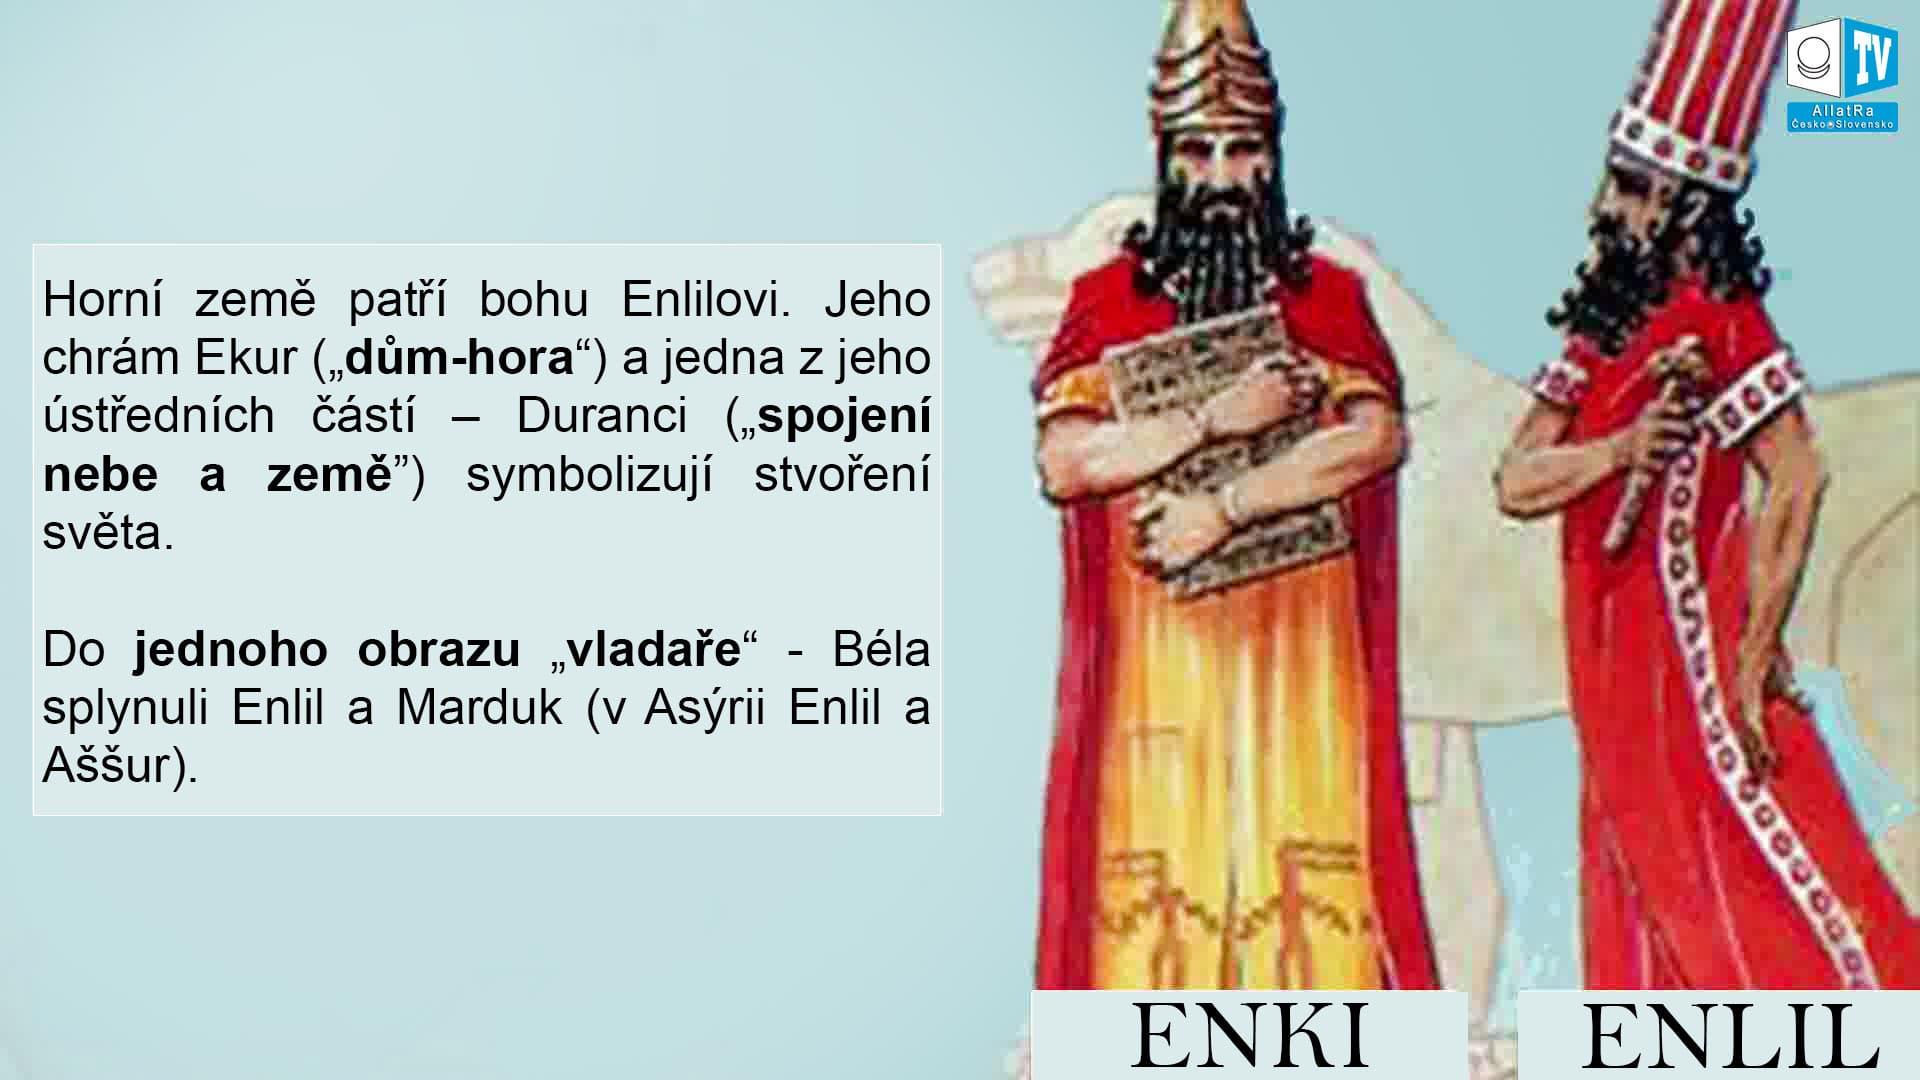 Enki. Enlil. Foto